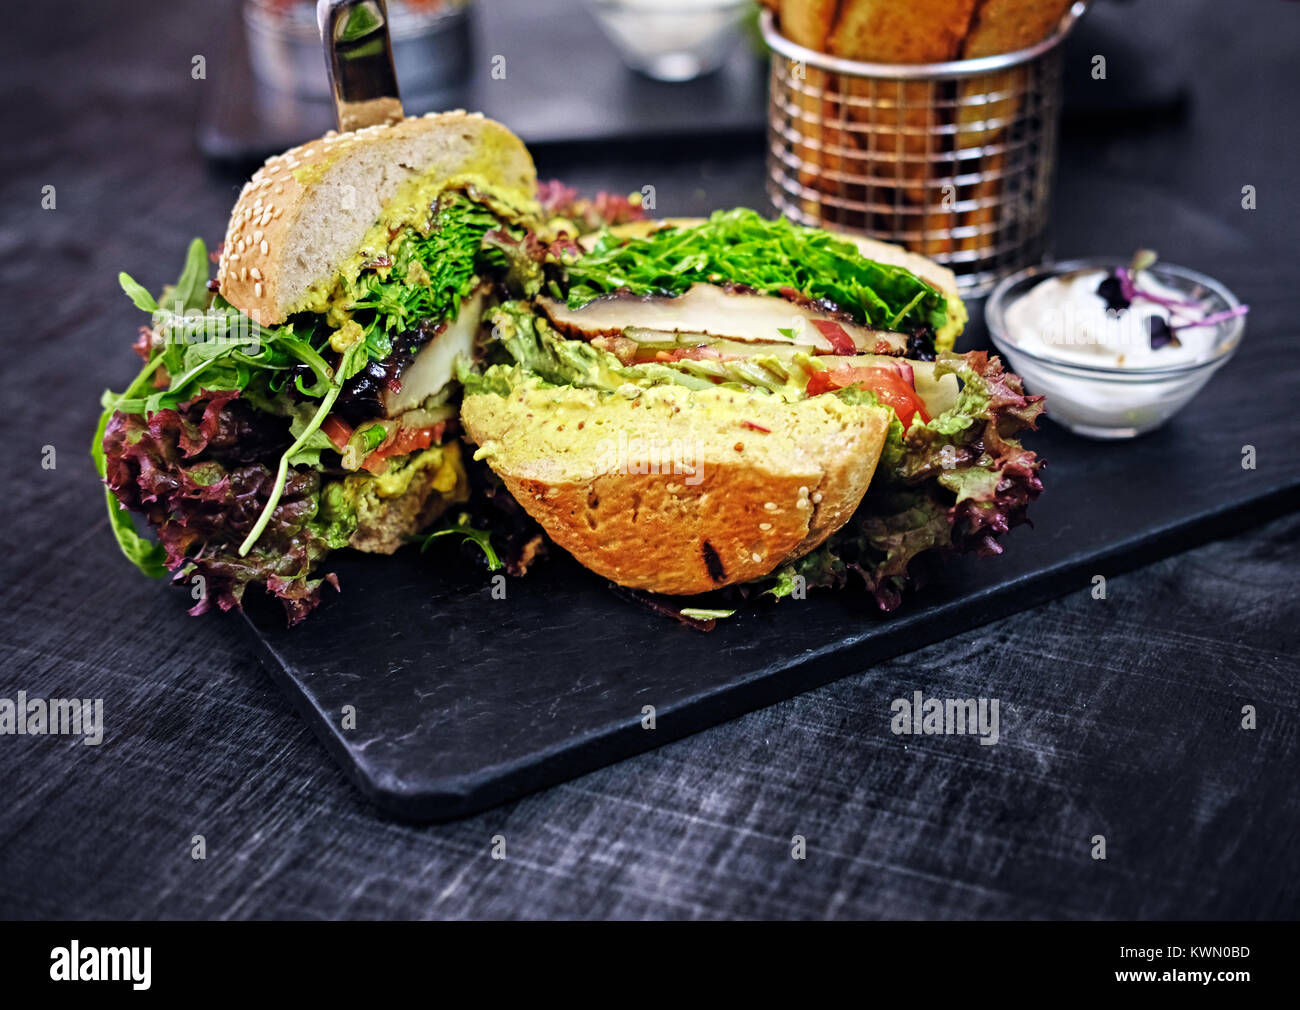 Vegan mushroom burger with salad - Stock Image